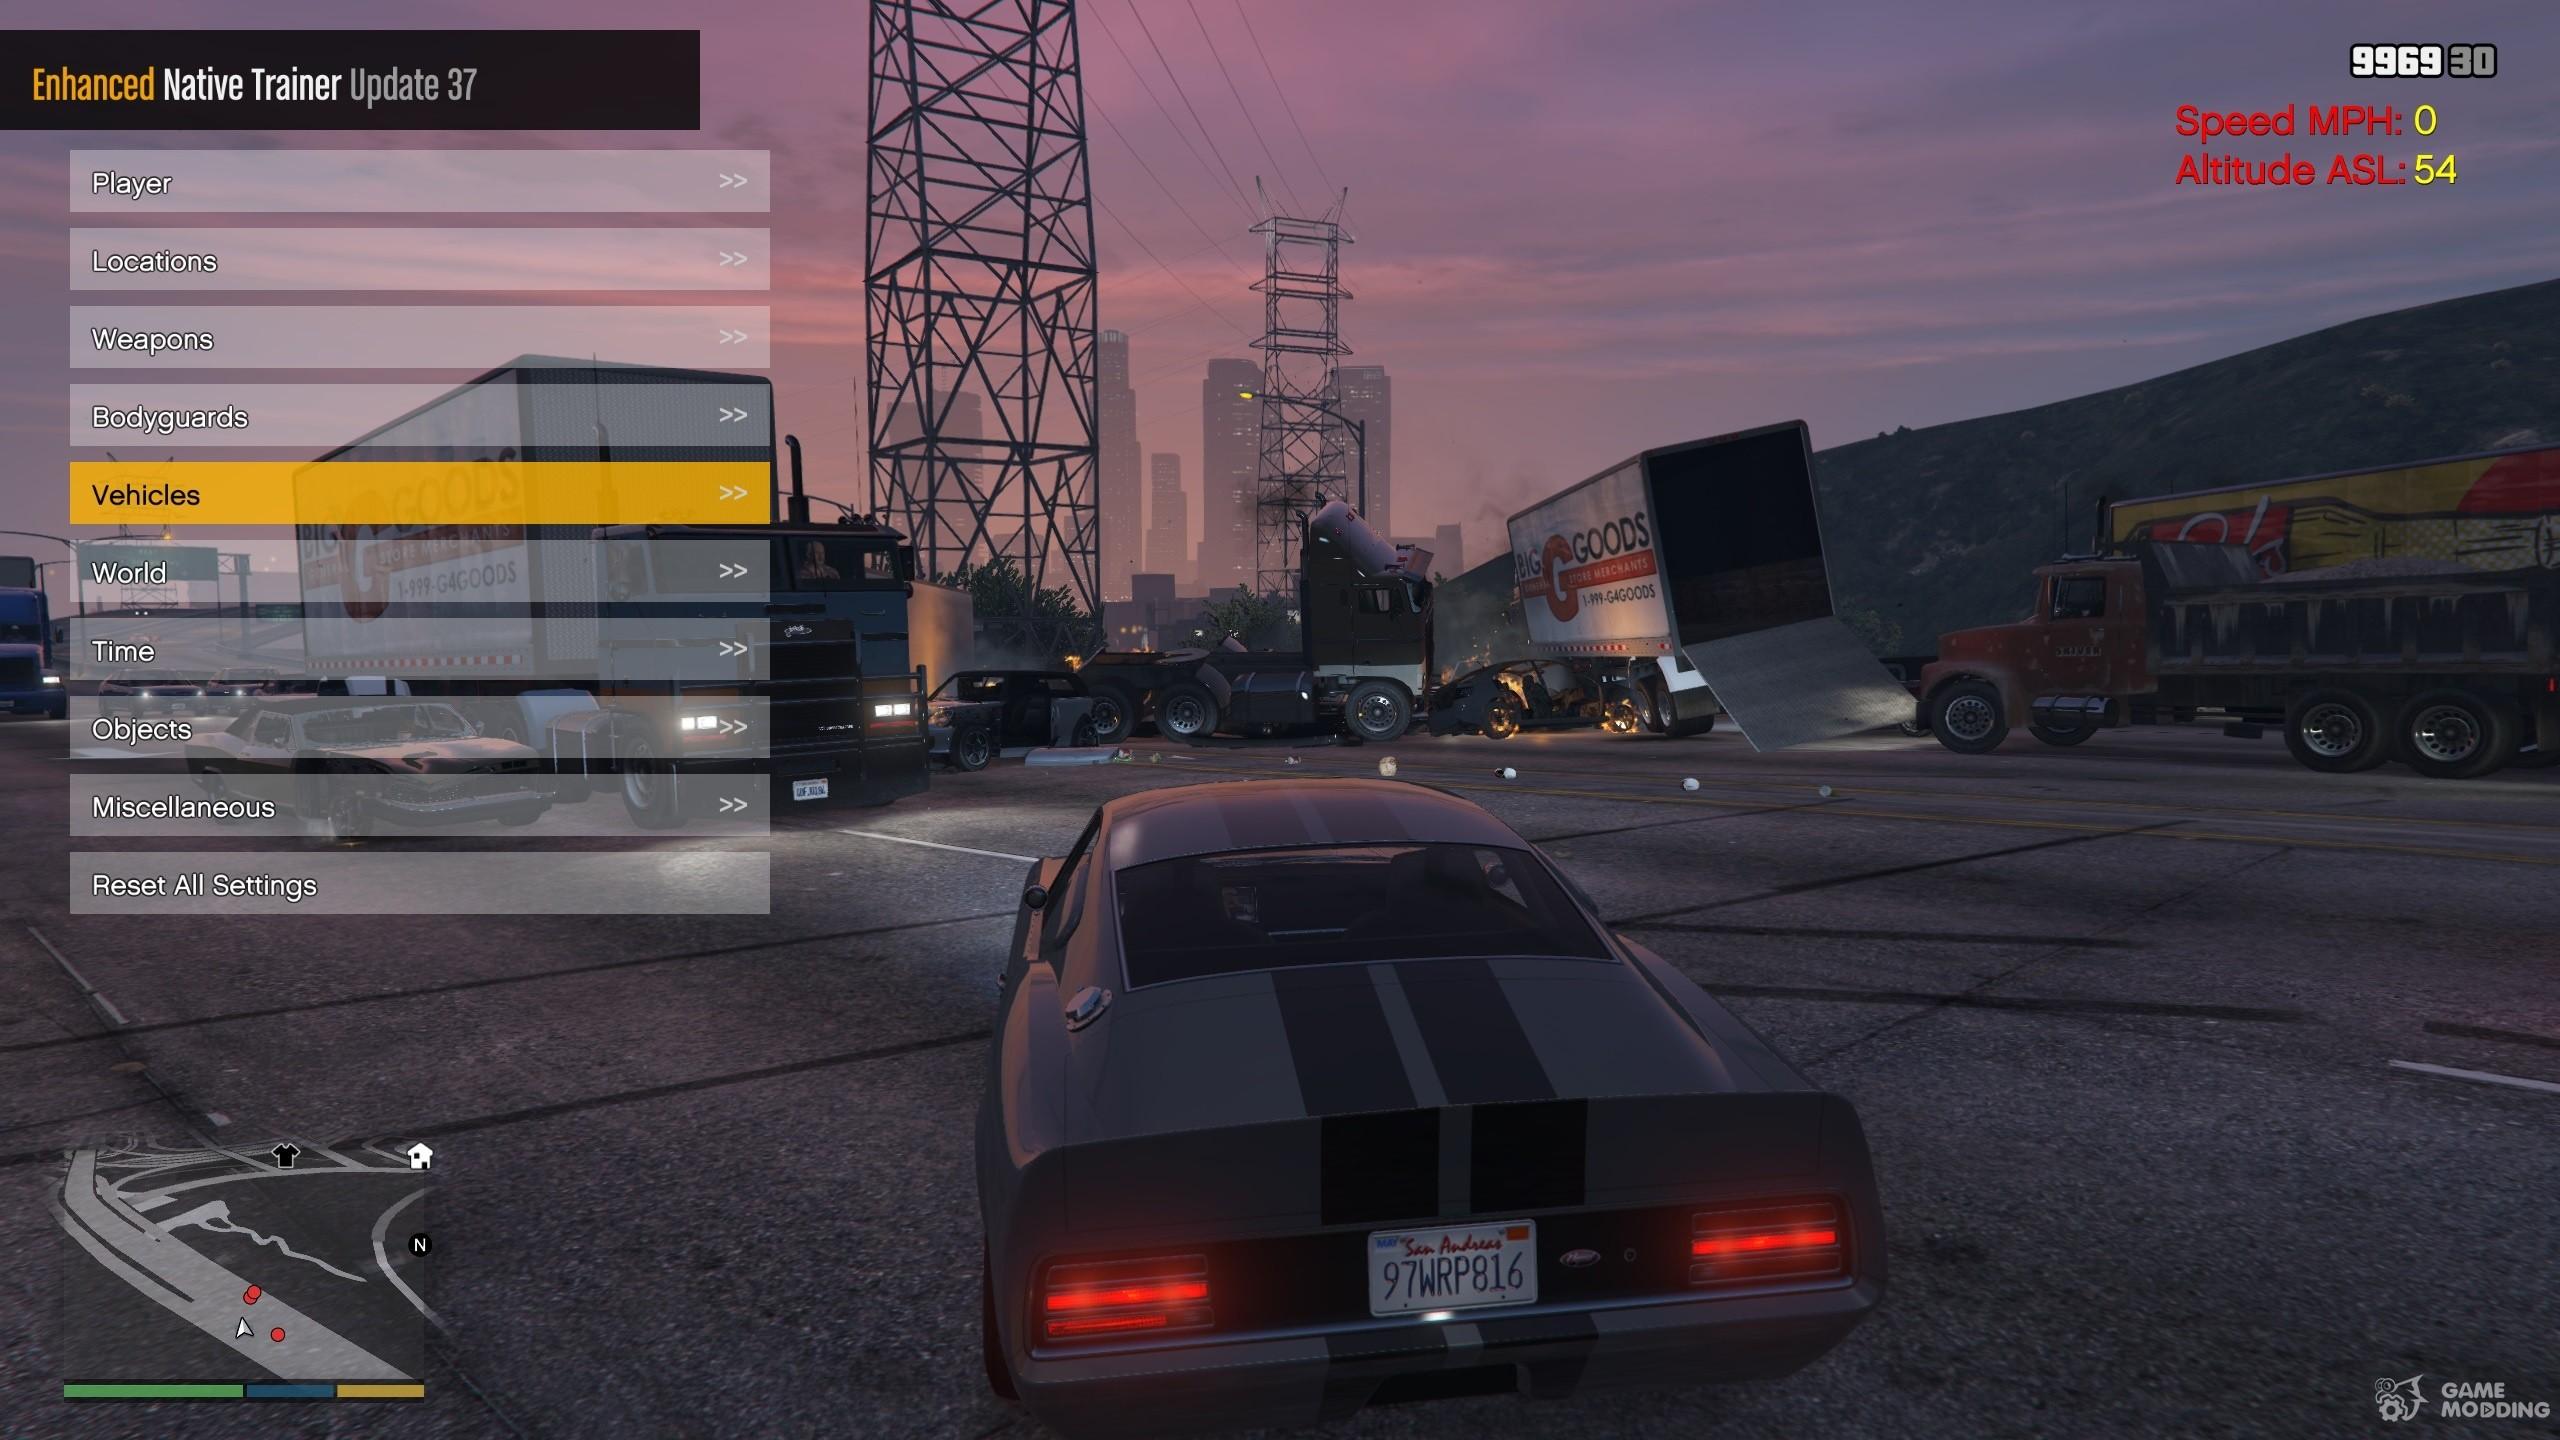 Enhanced Native Trainer Update 39 for GTA 5